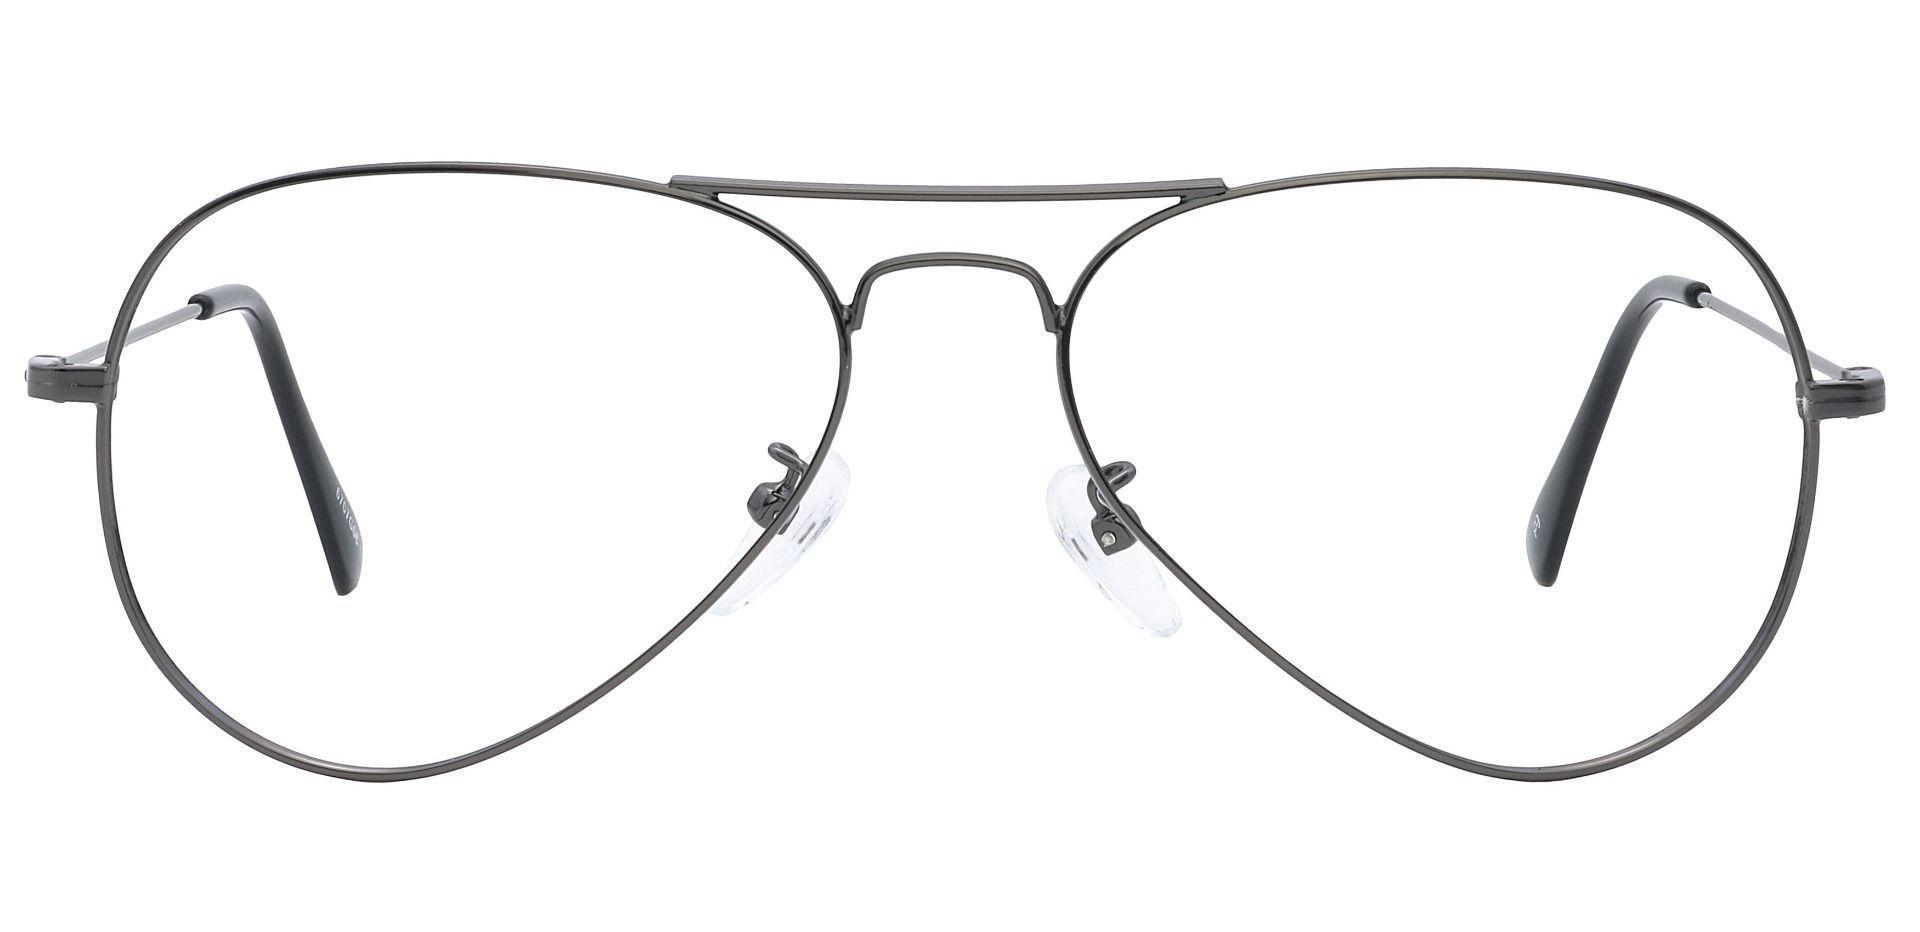 Memphis Aviator Blue Light Blocking Glasses - Gray